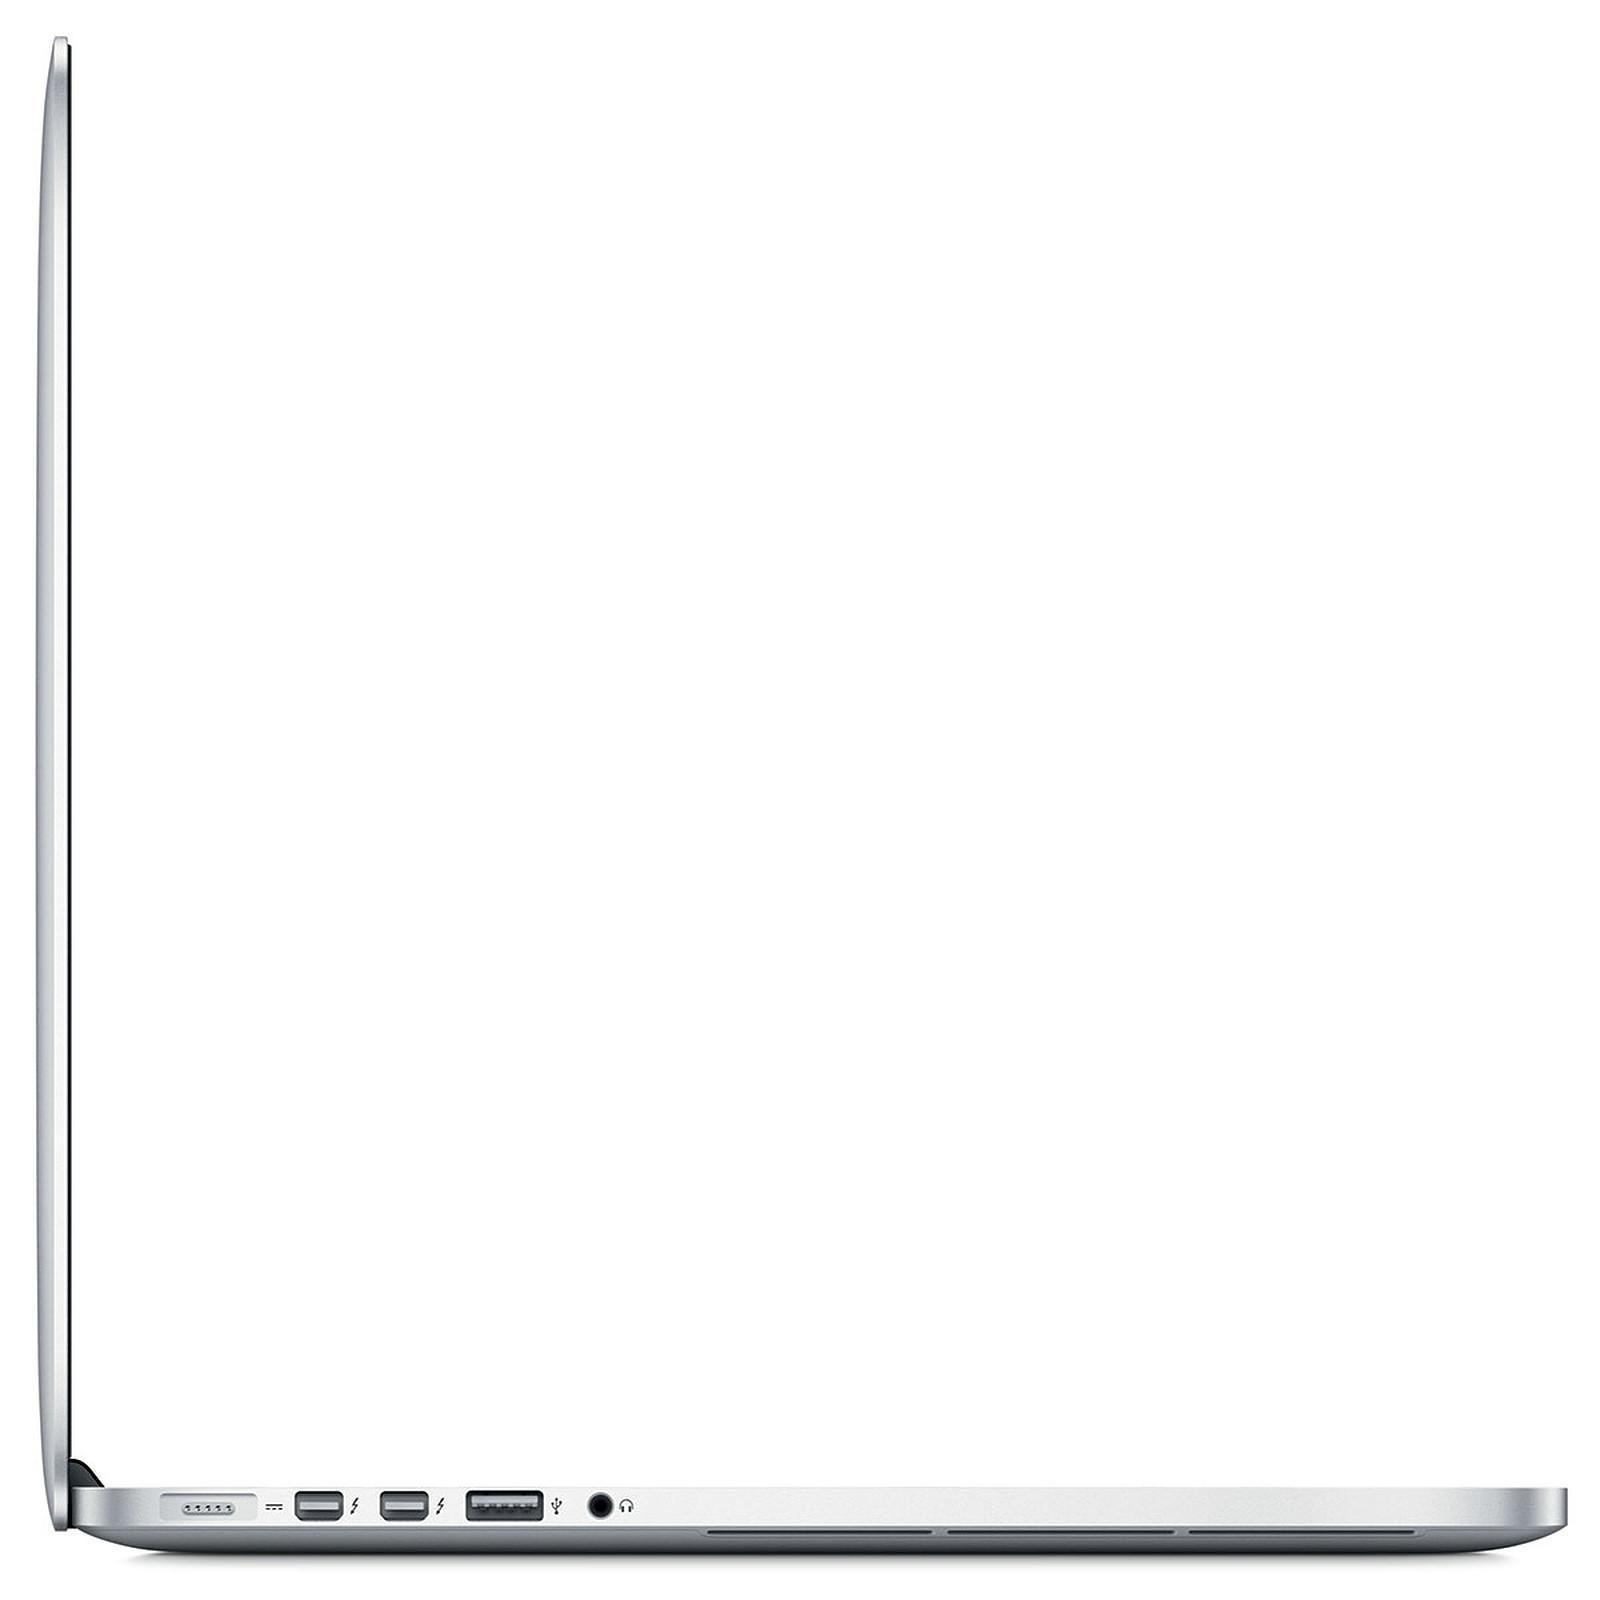 MacBook Pro Retina 15.4-inch (2012) - Core i7 - 8GB - SSD 256 GB